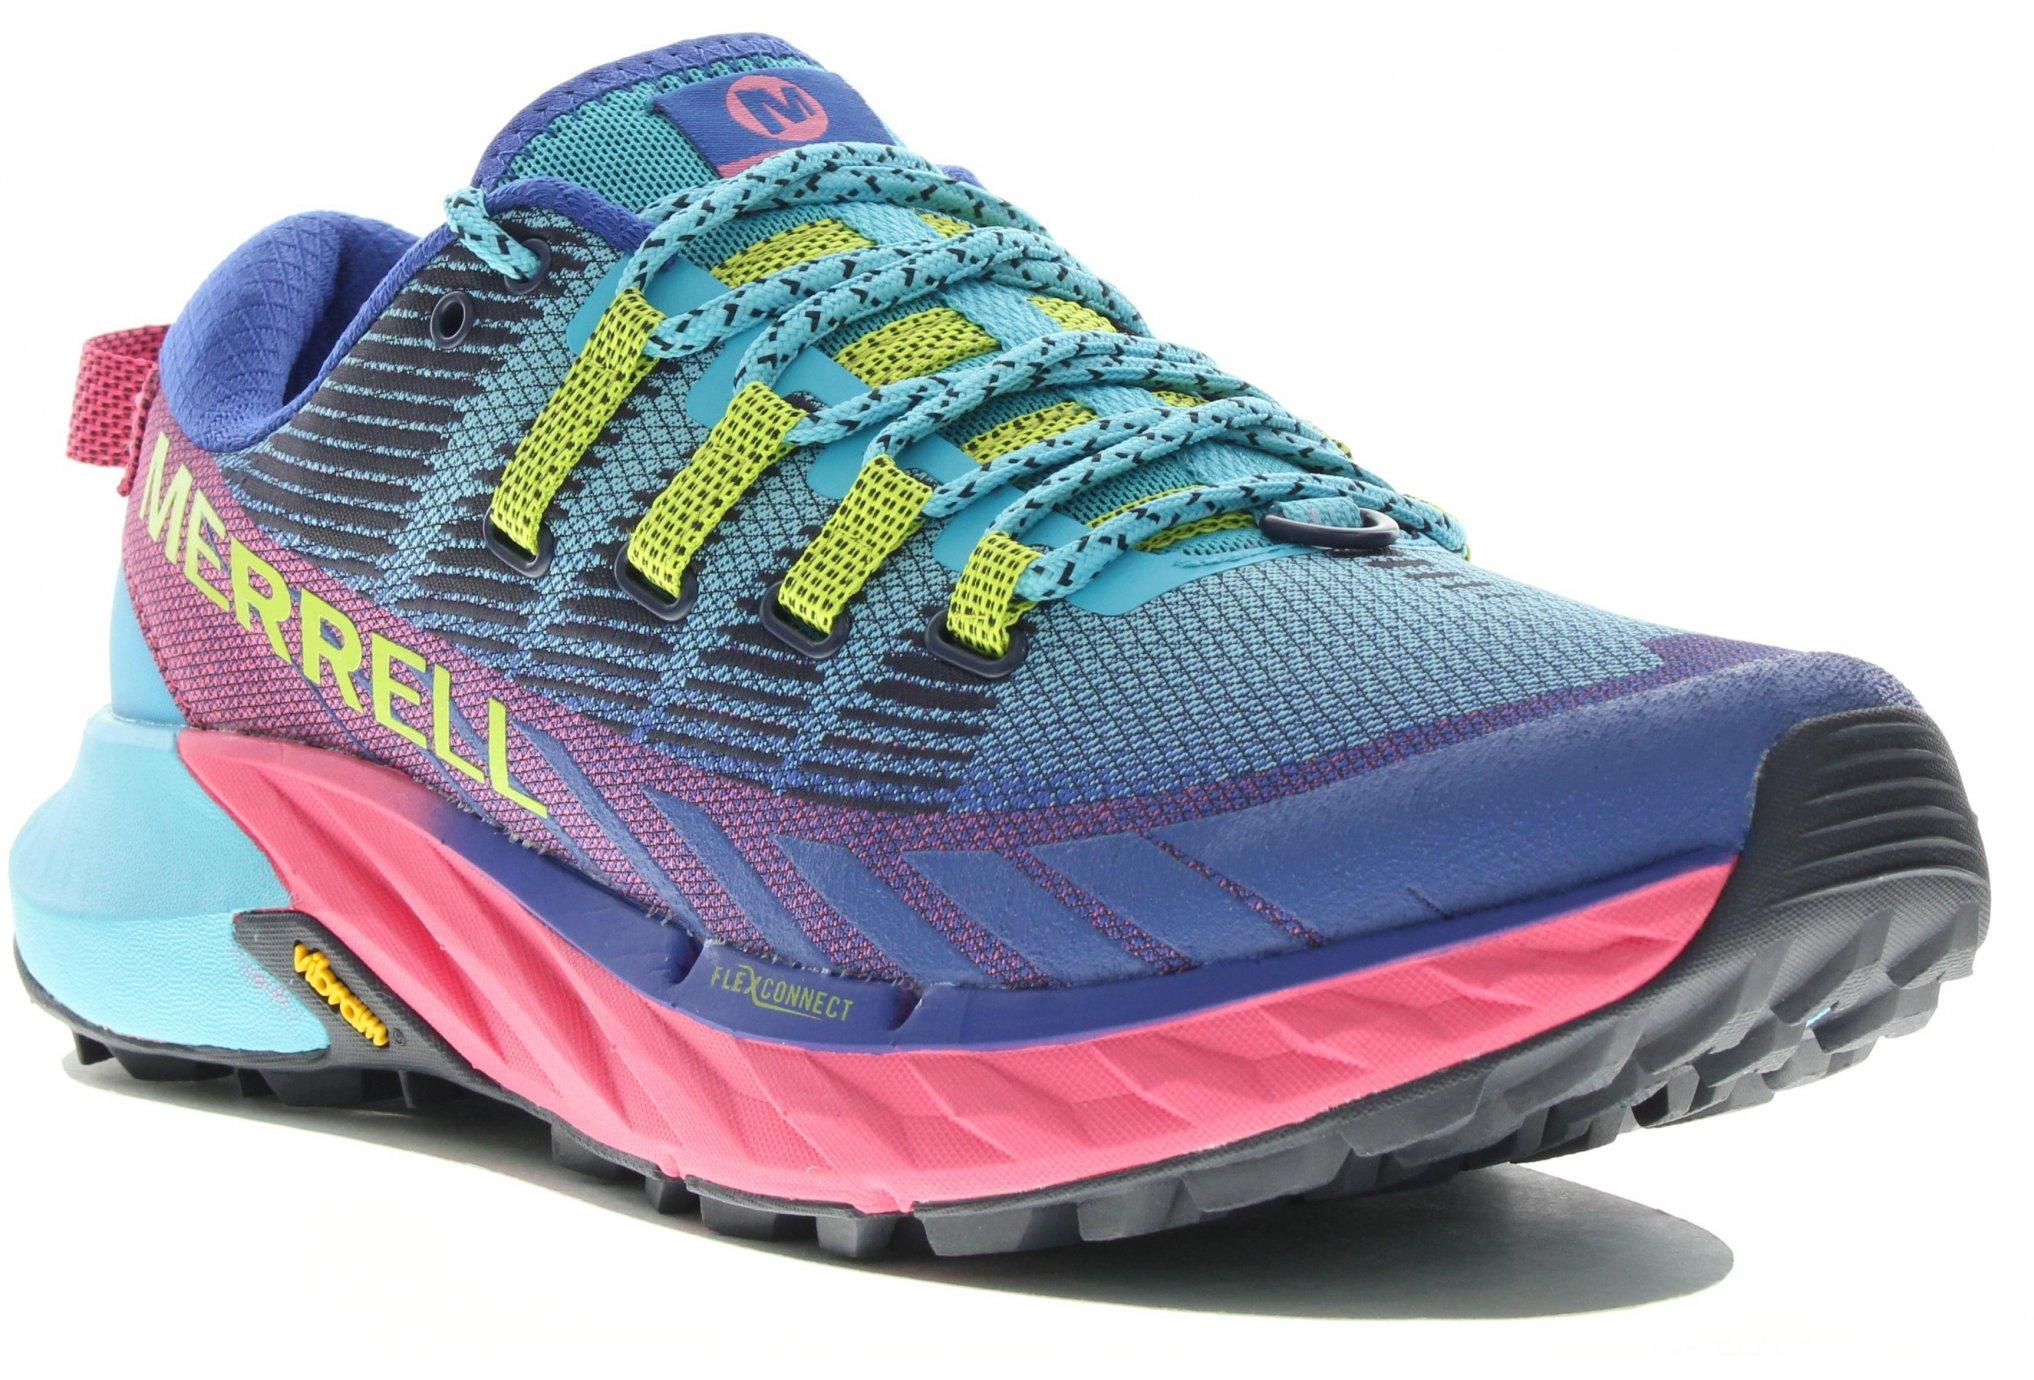 Merrell Agility Peak 4 W Chaussures running femme